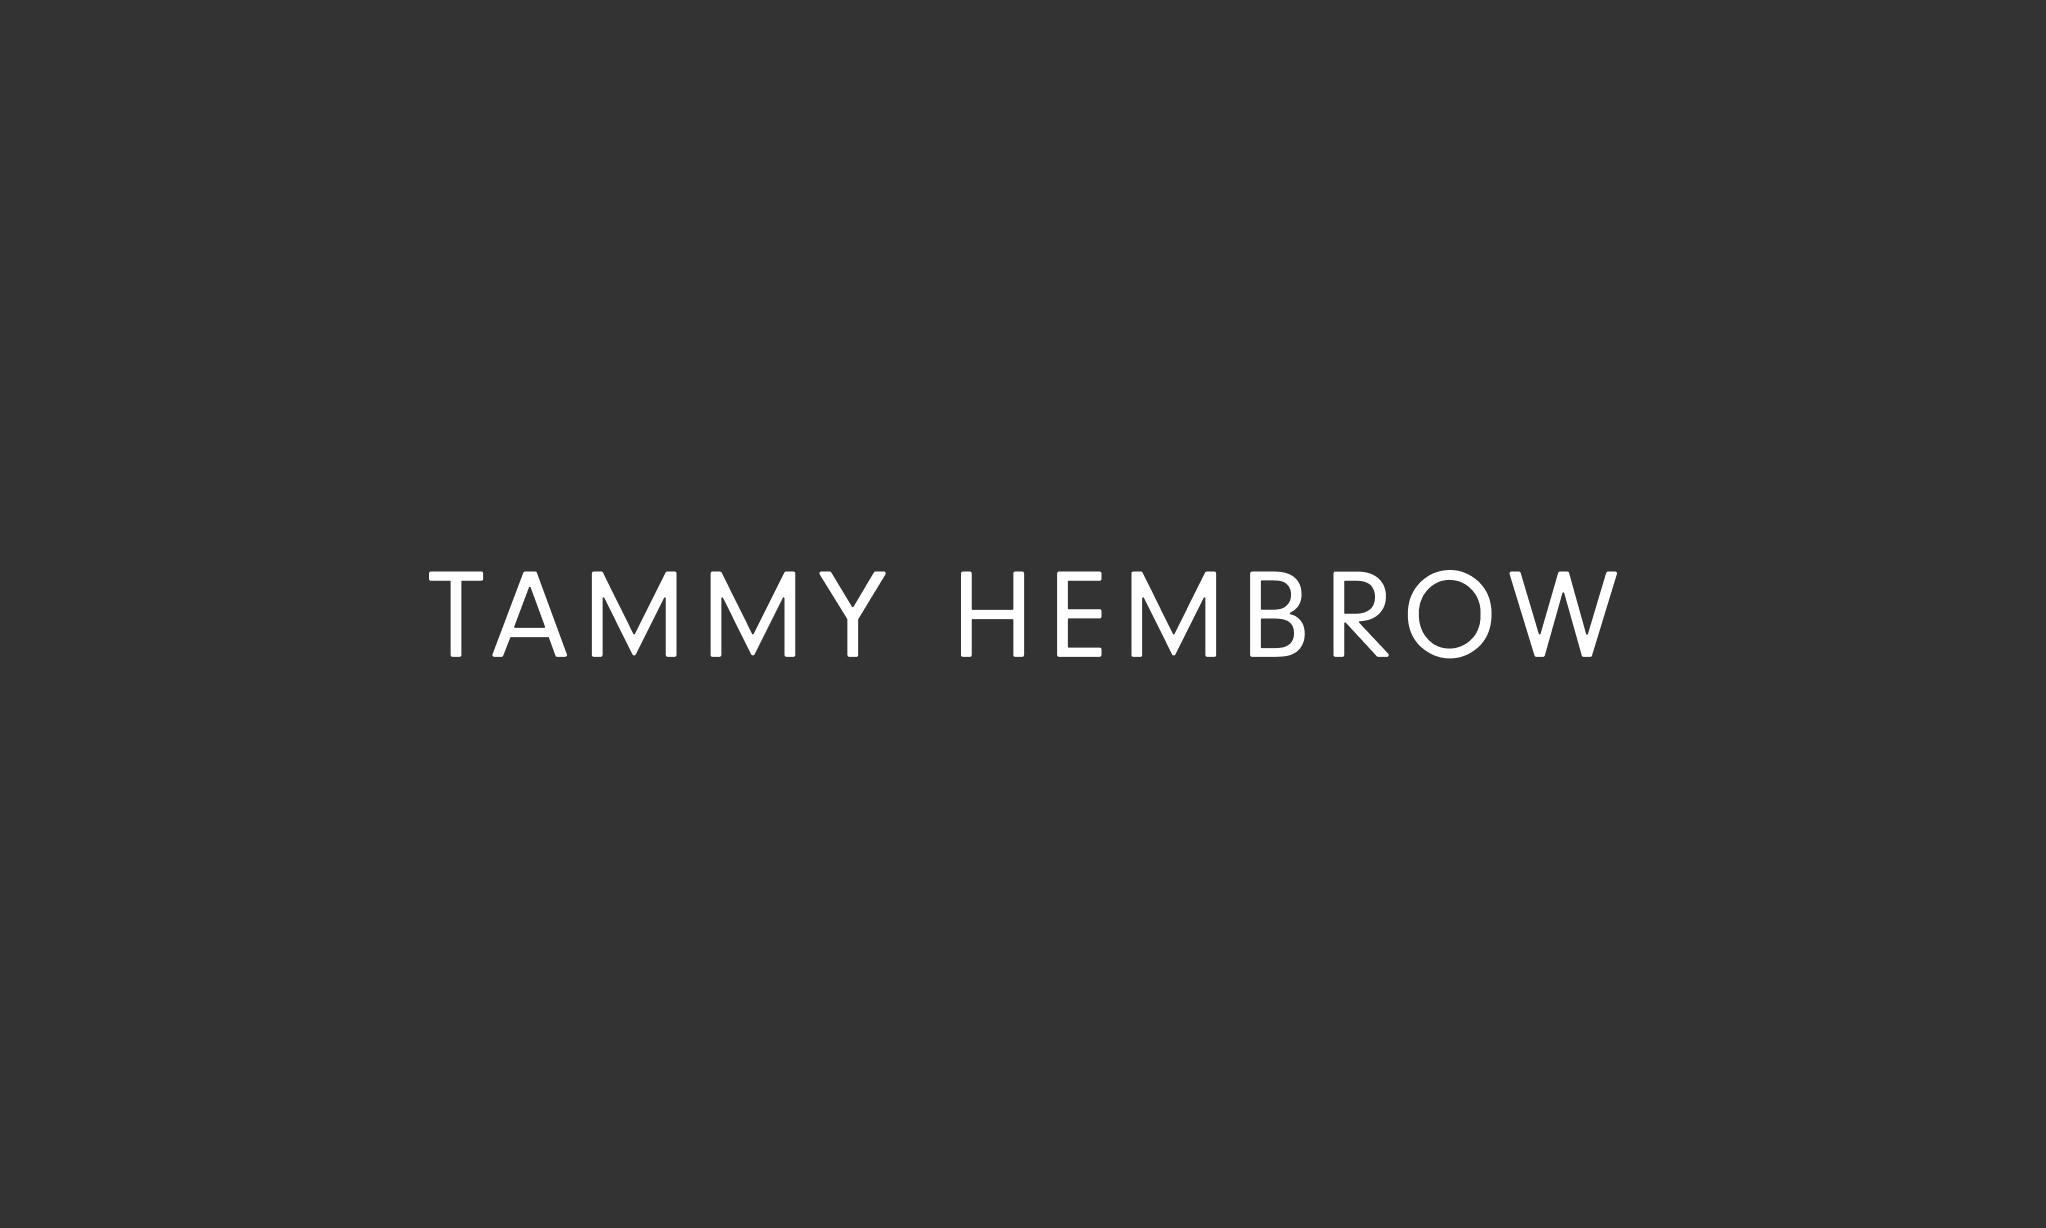 <p>Logotype and corresponding logomark for Tammy's personal brand.</p>